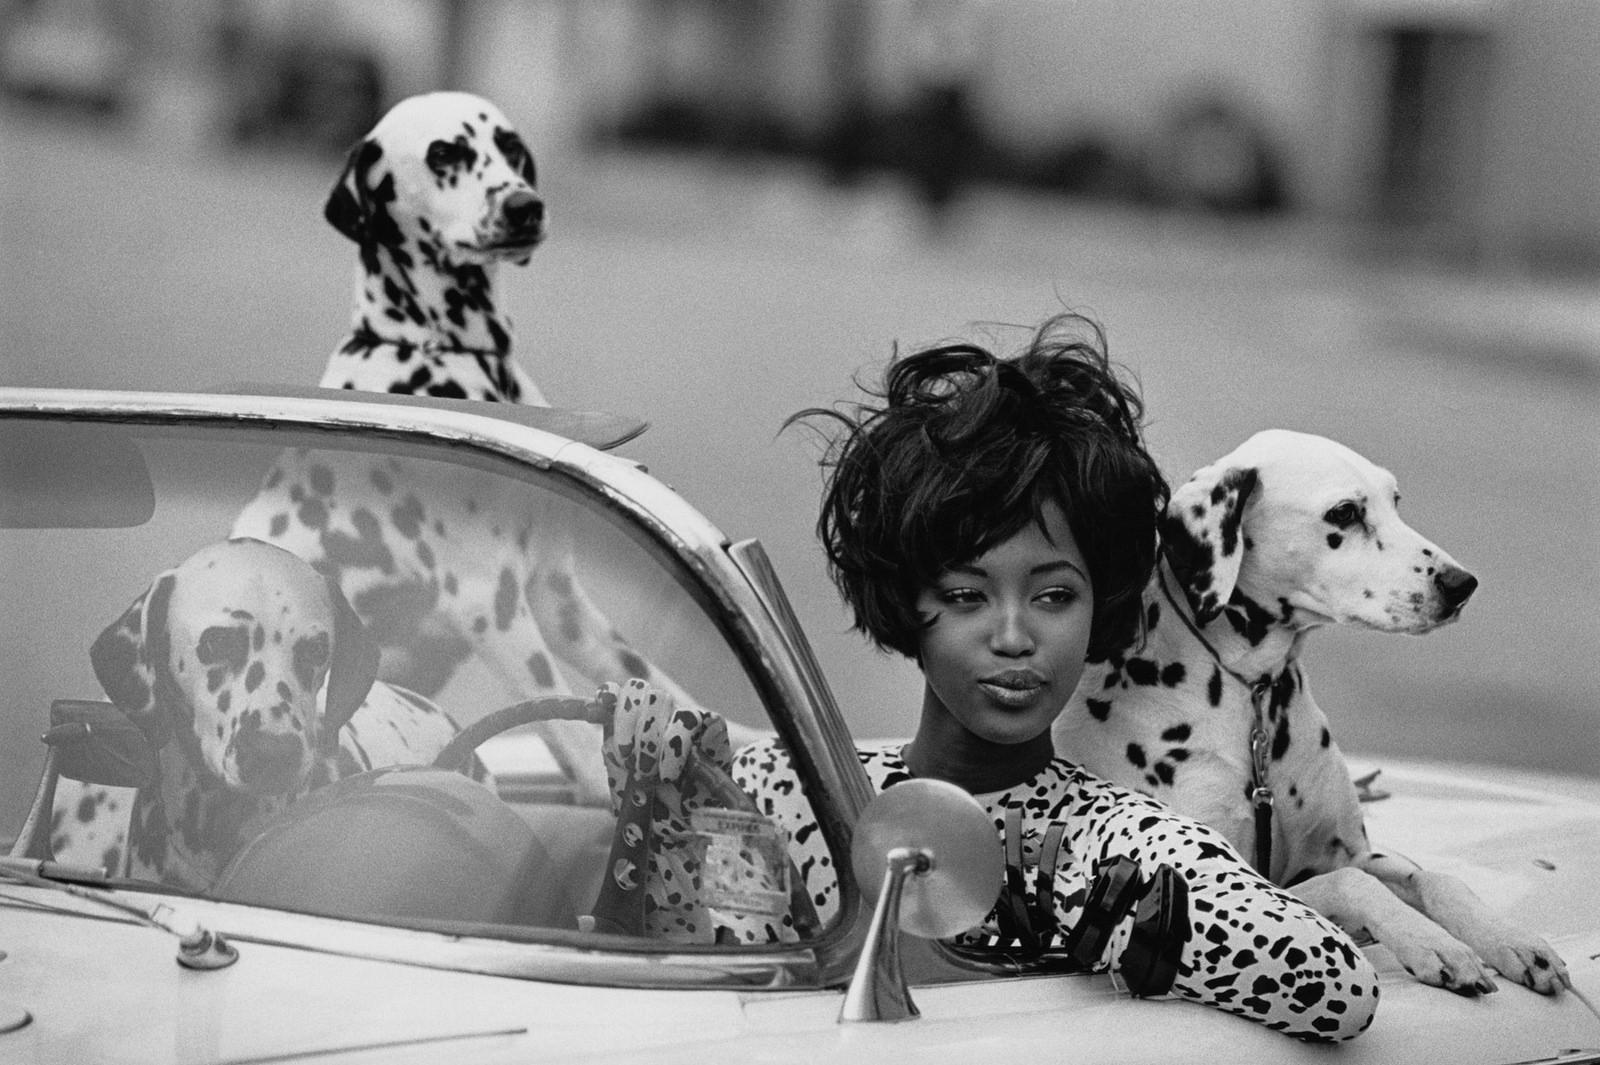 dog dalmatians in car